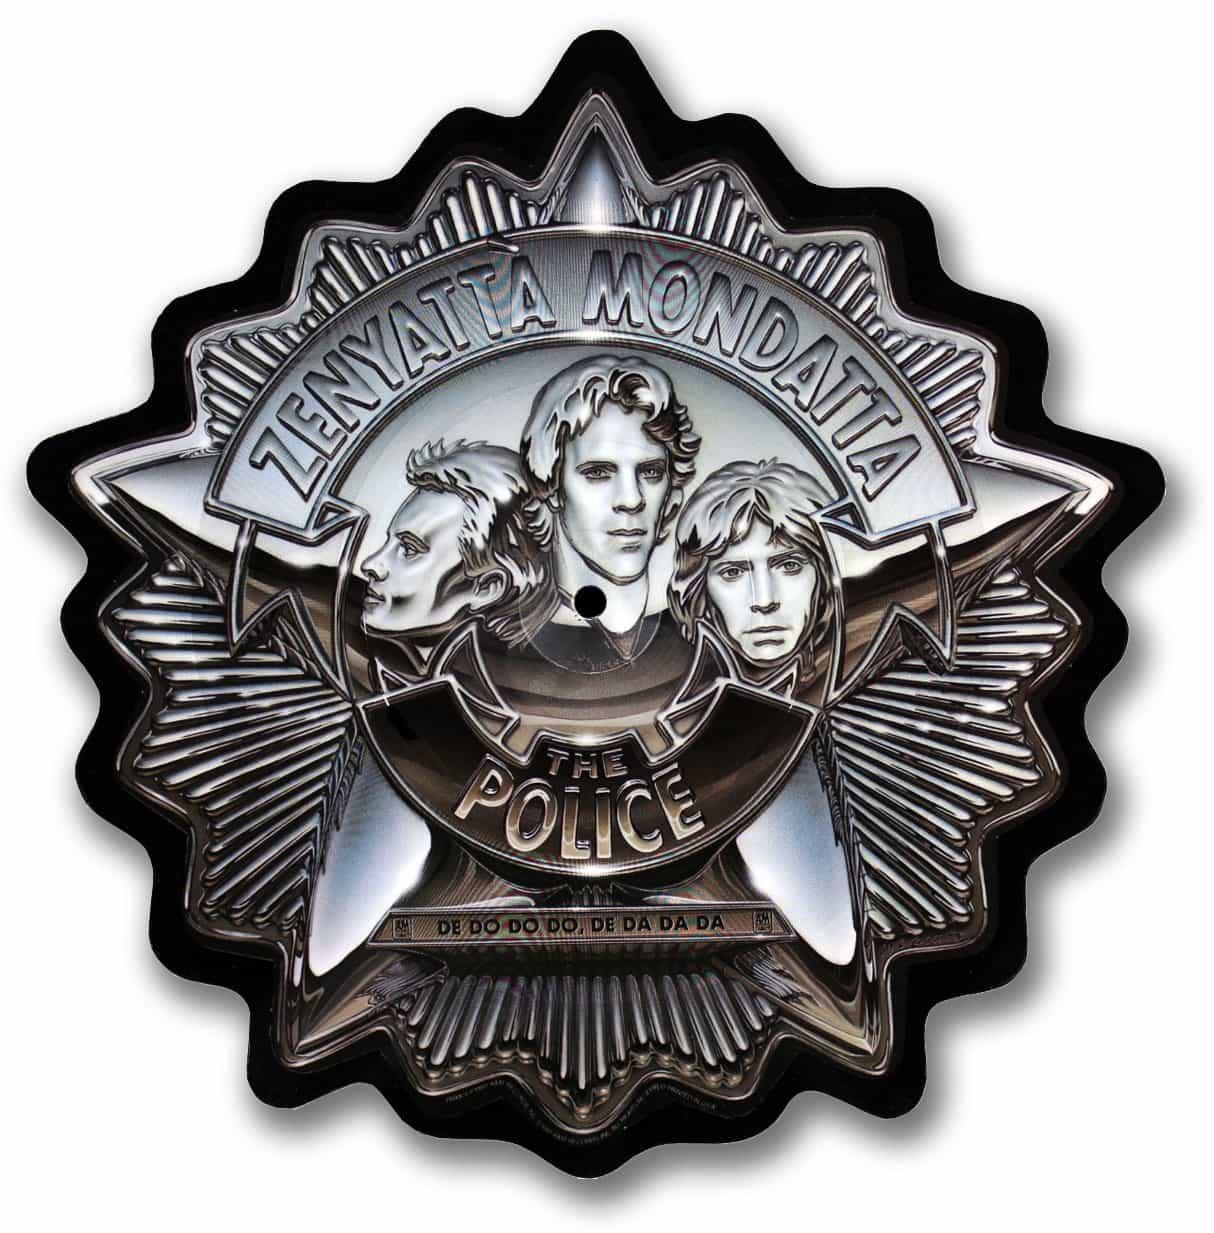 Police - Zenyatta Mondatta picture disc